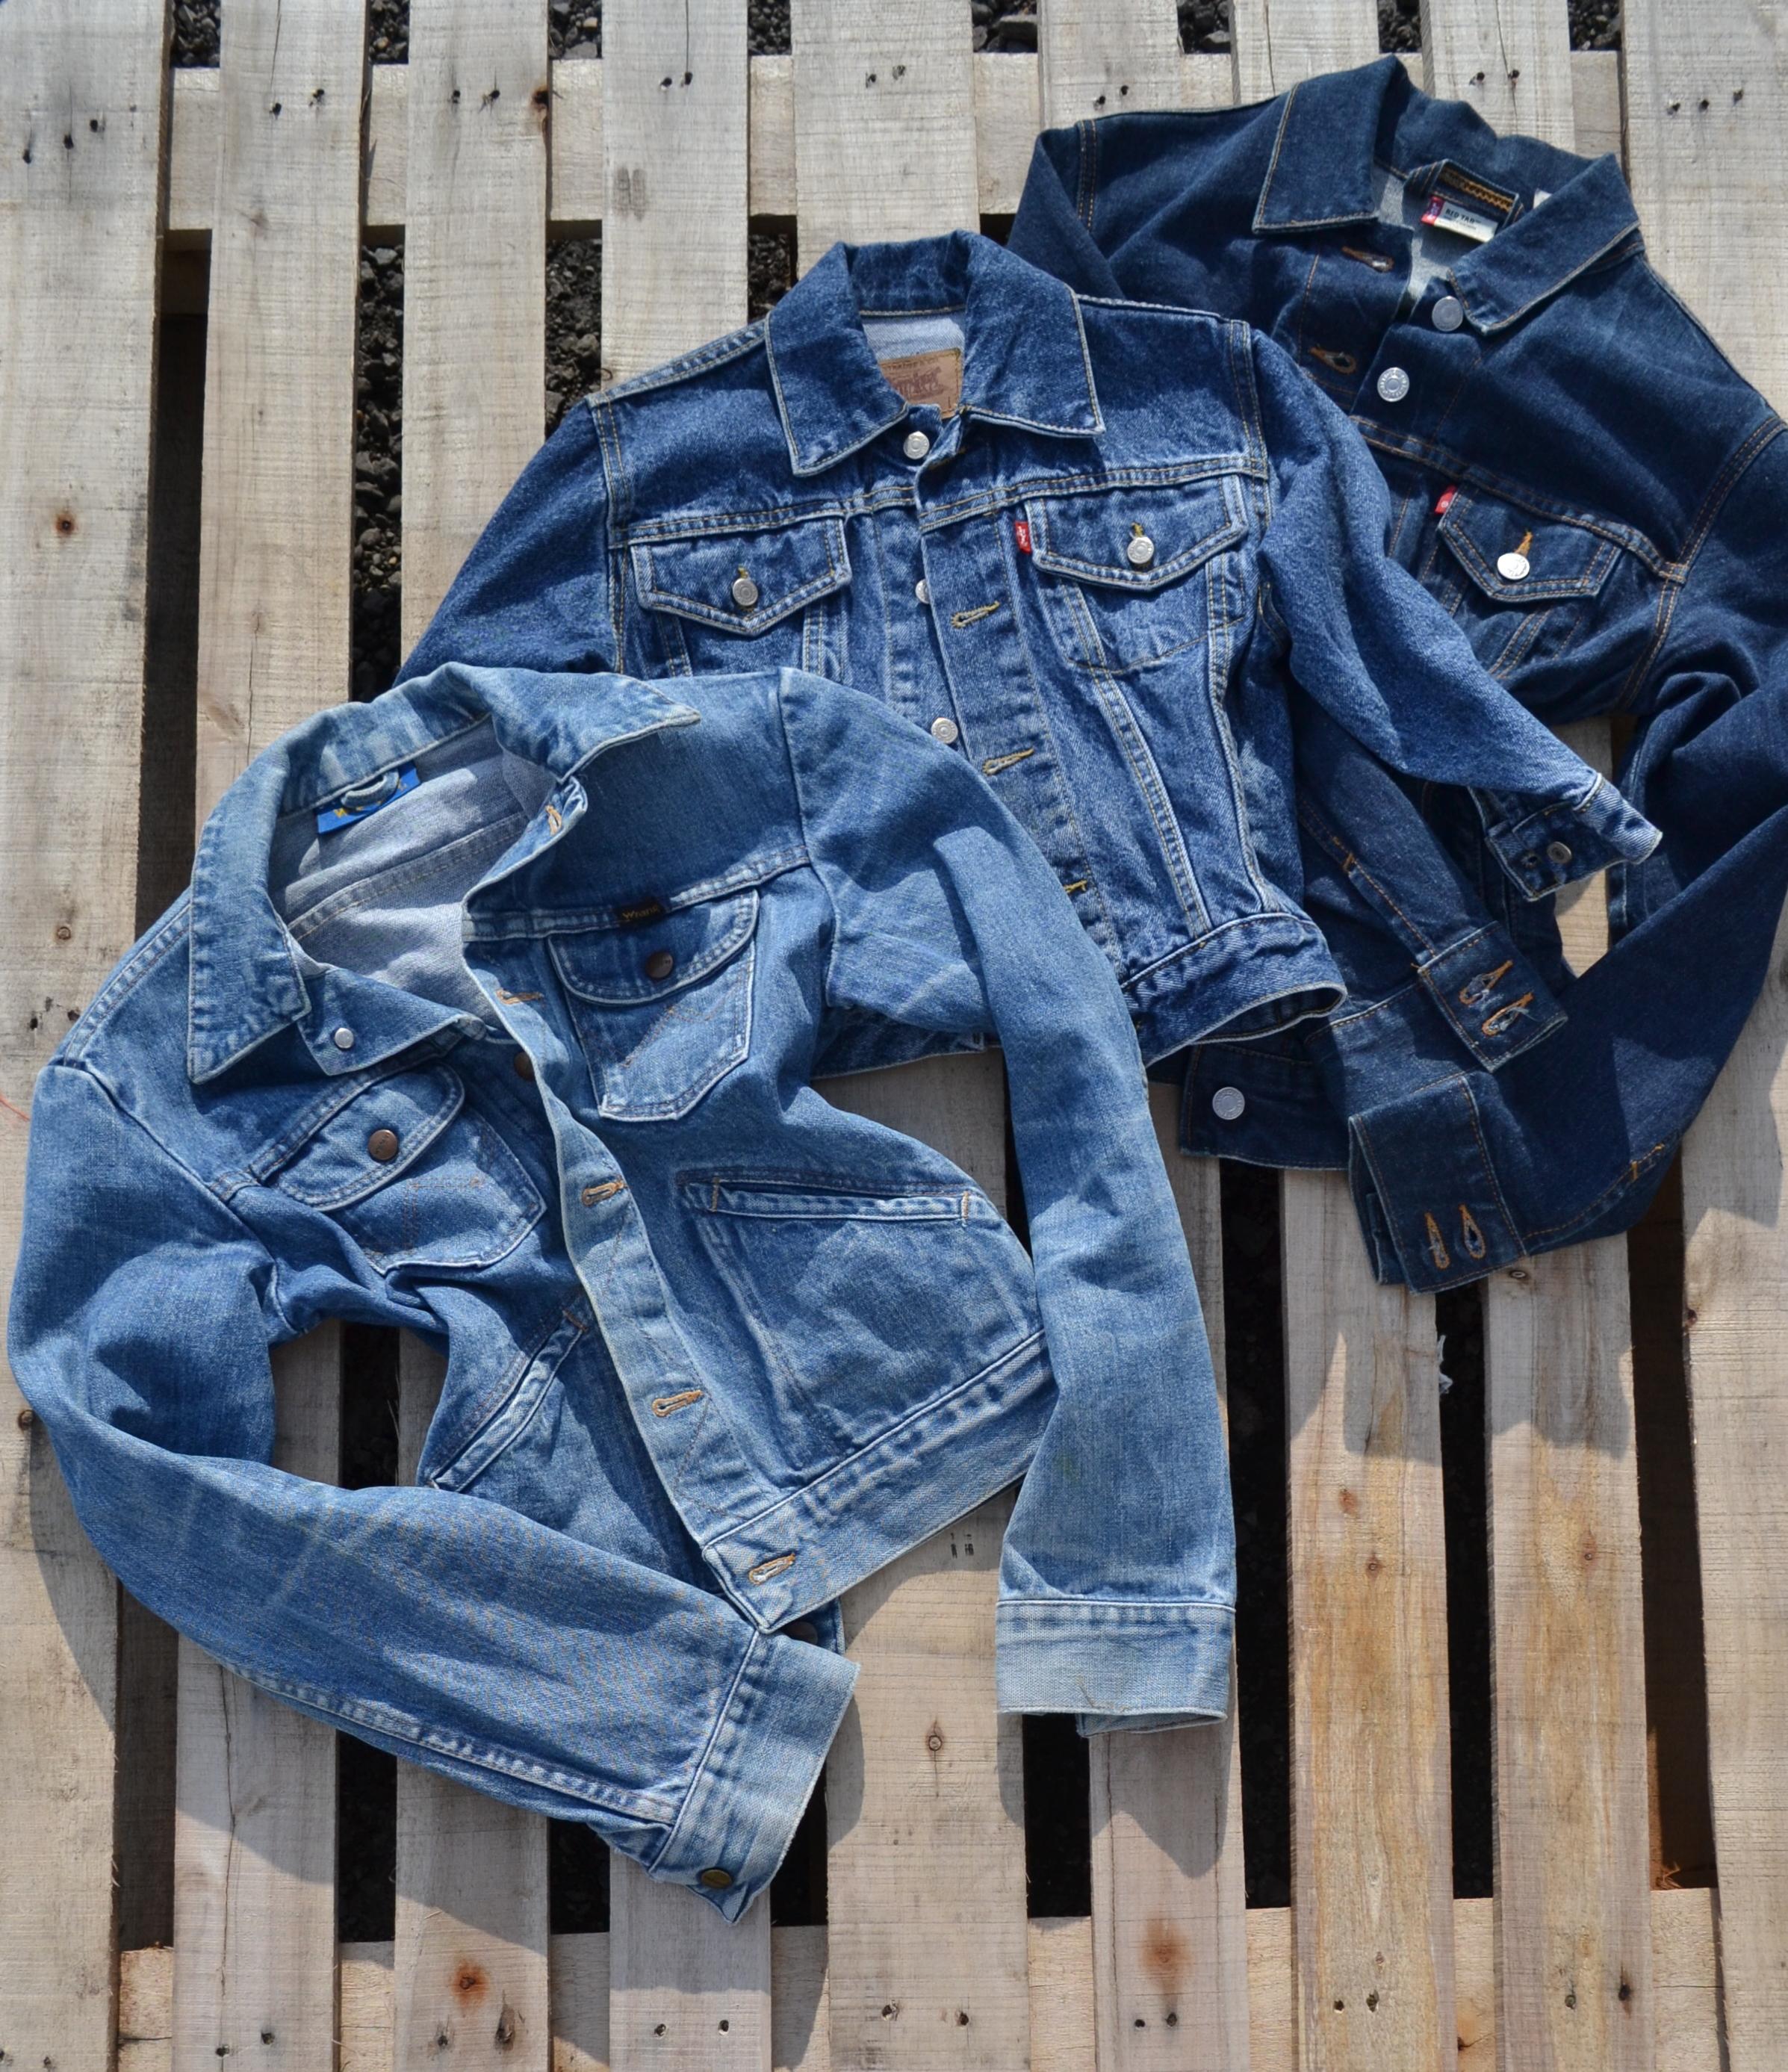 levi's giacche jeans tagloe